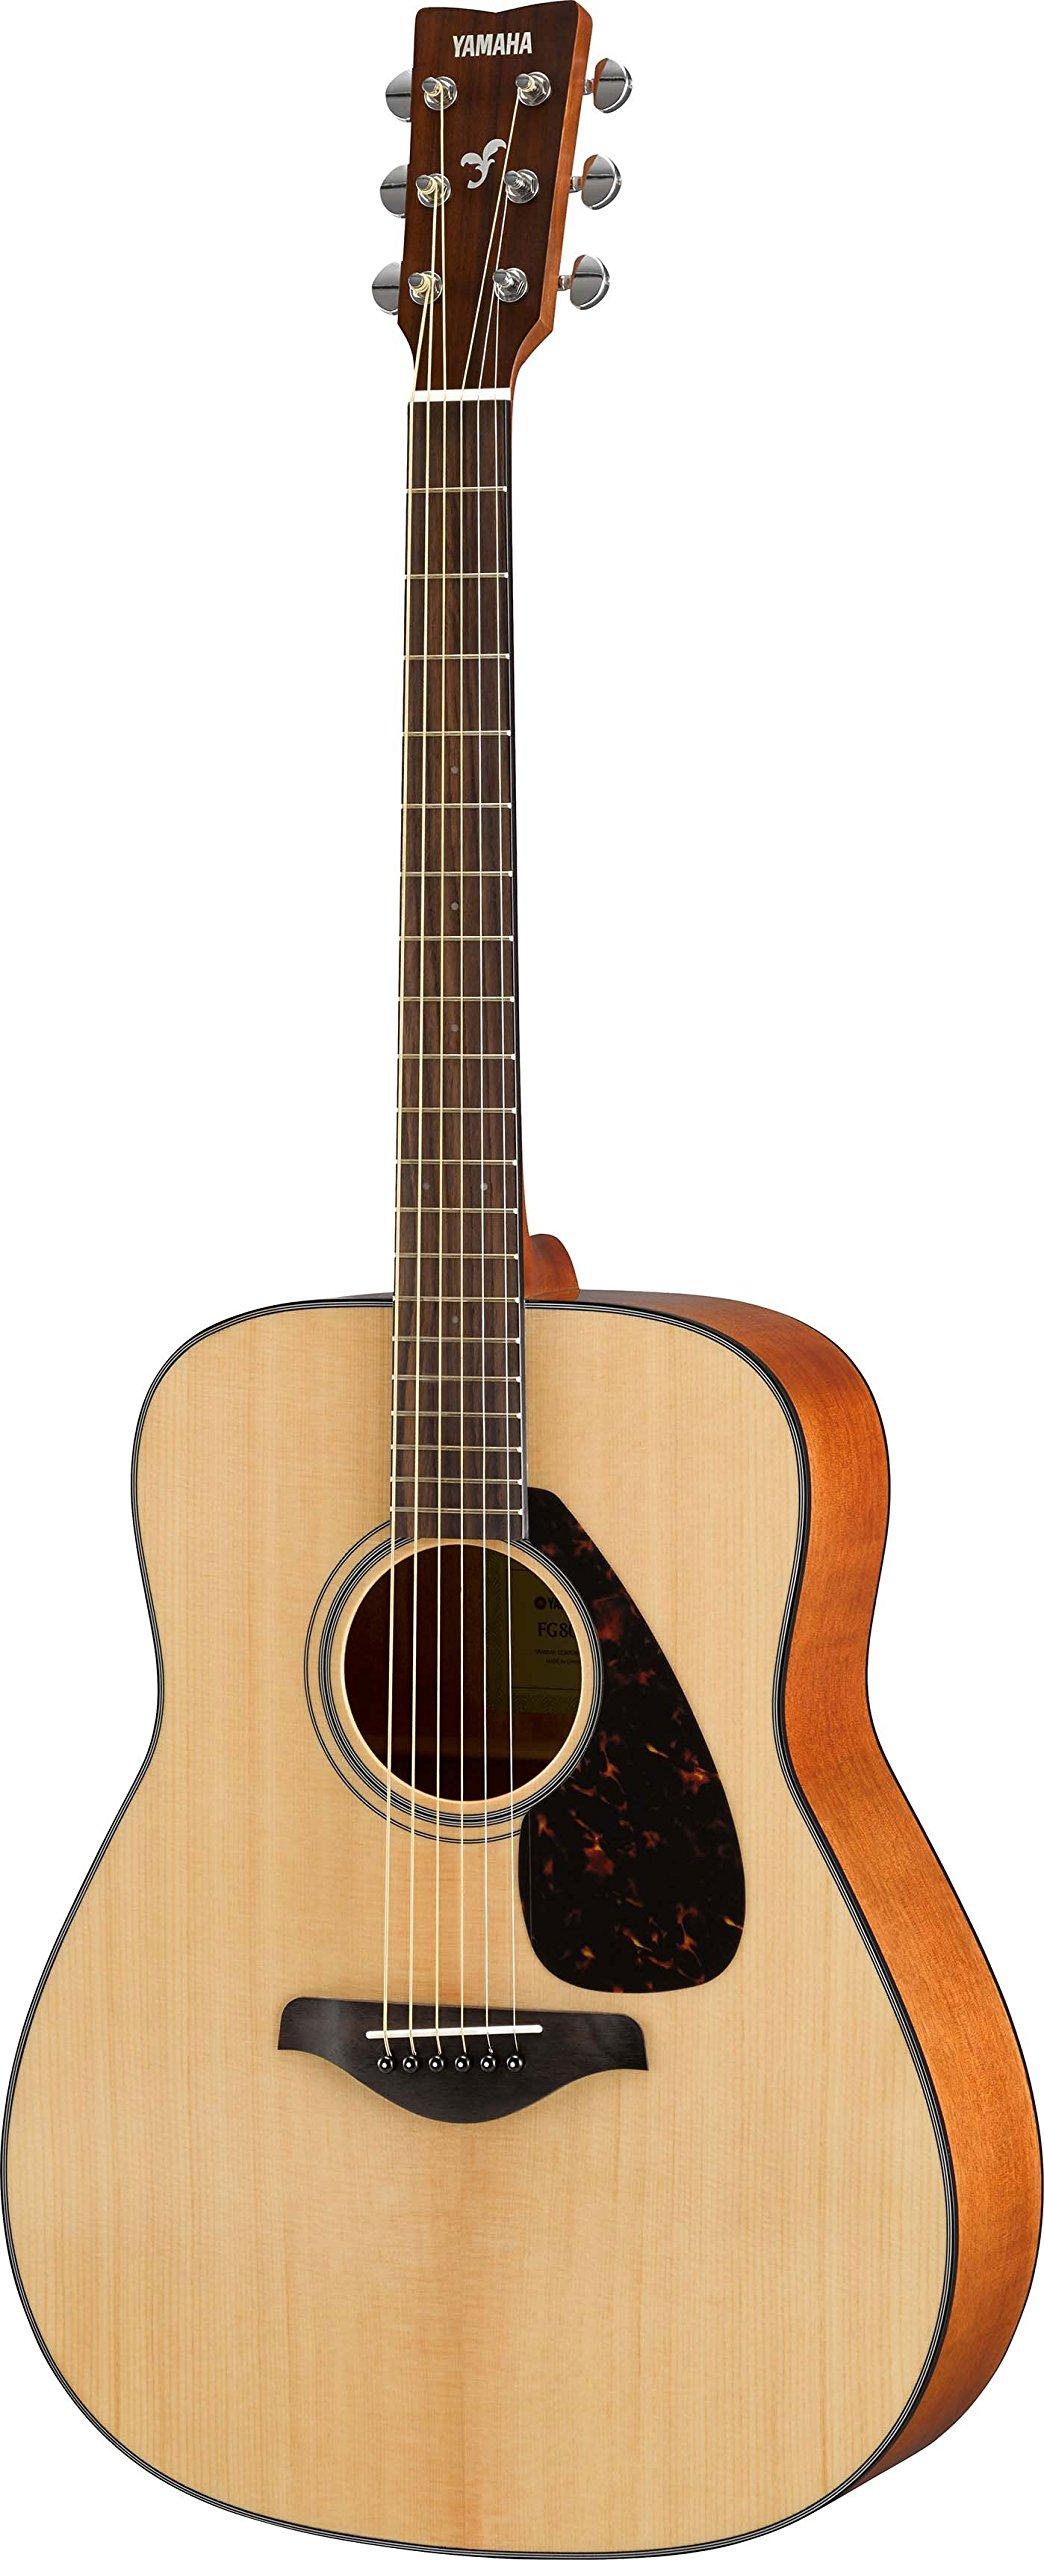 Yamaha Fg800 Solid Top Acoustic Guitar by YAMAHA